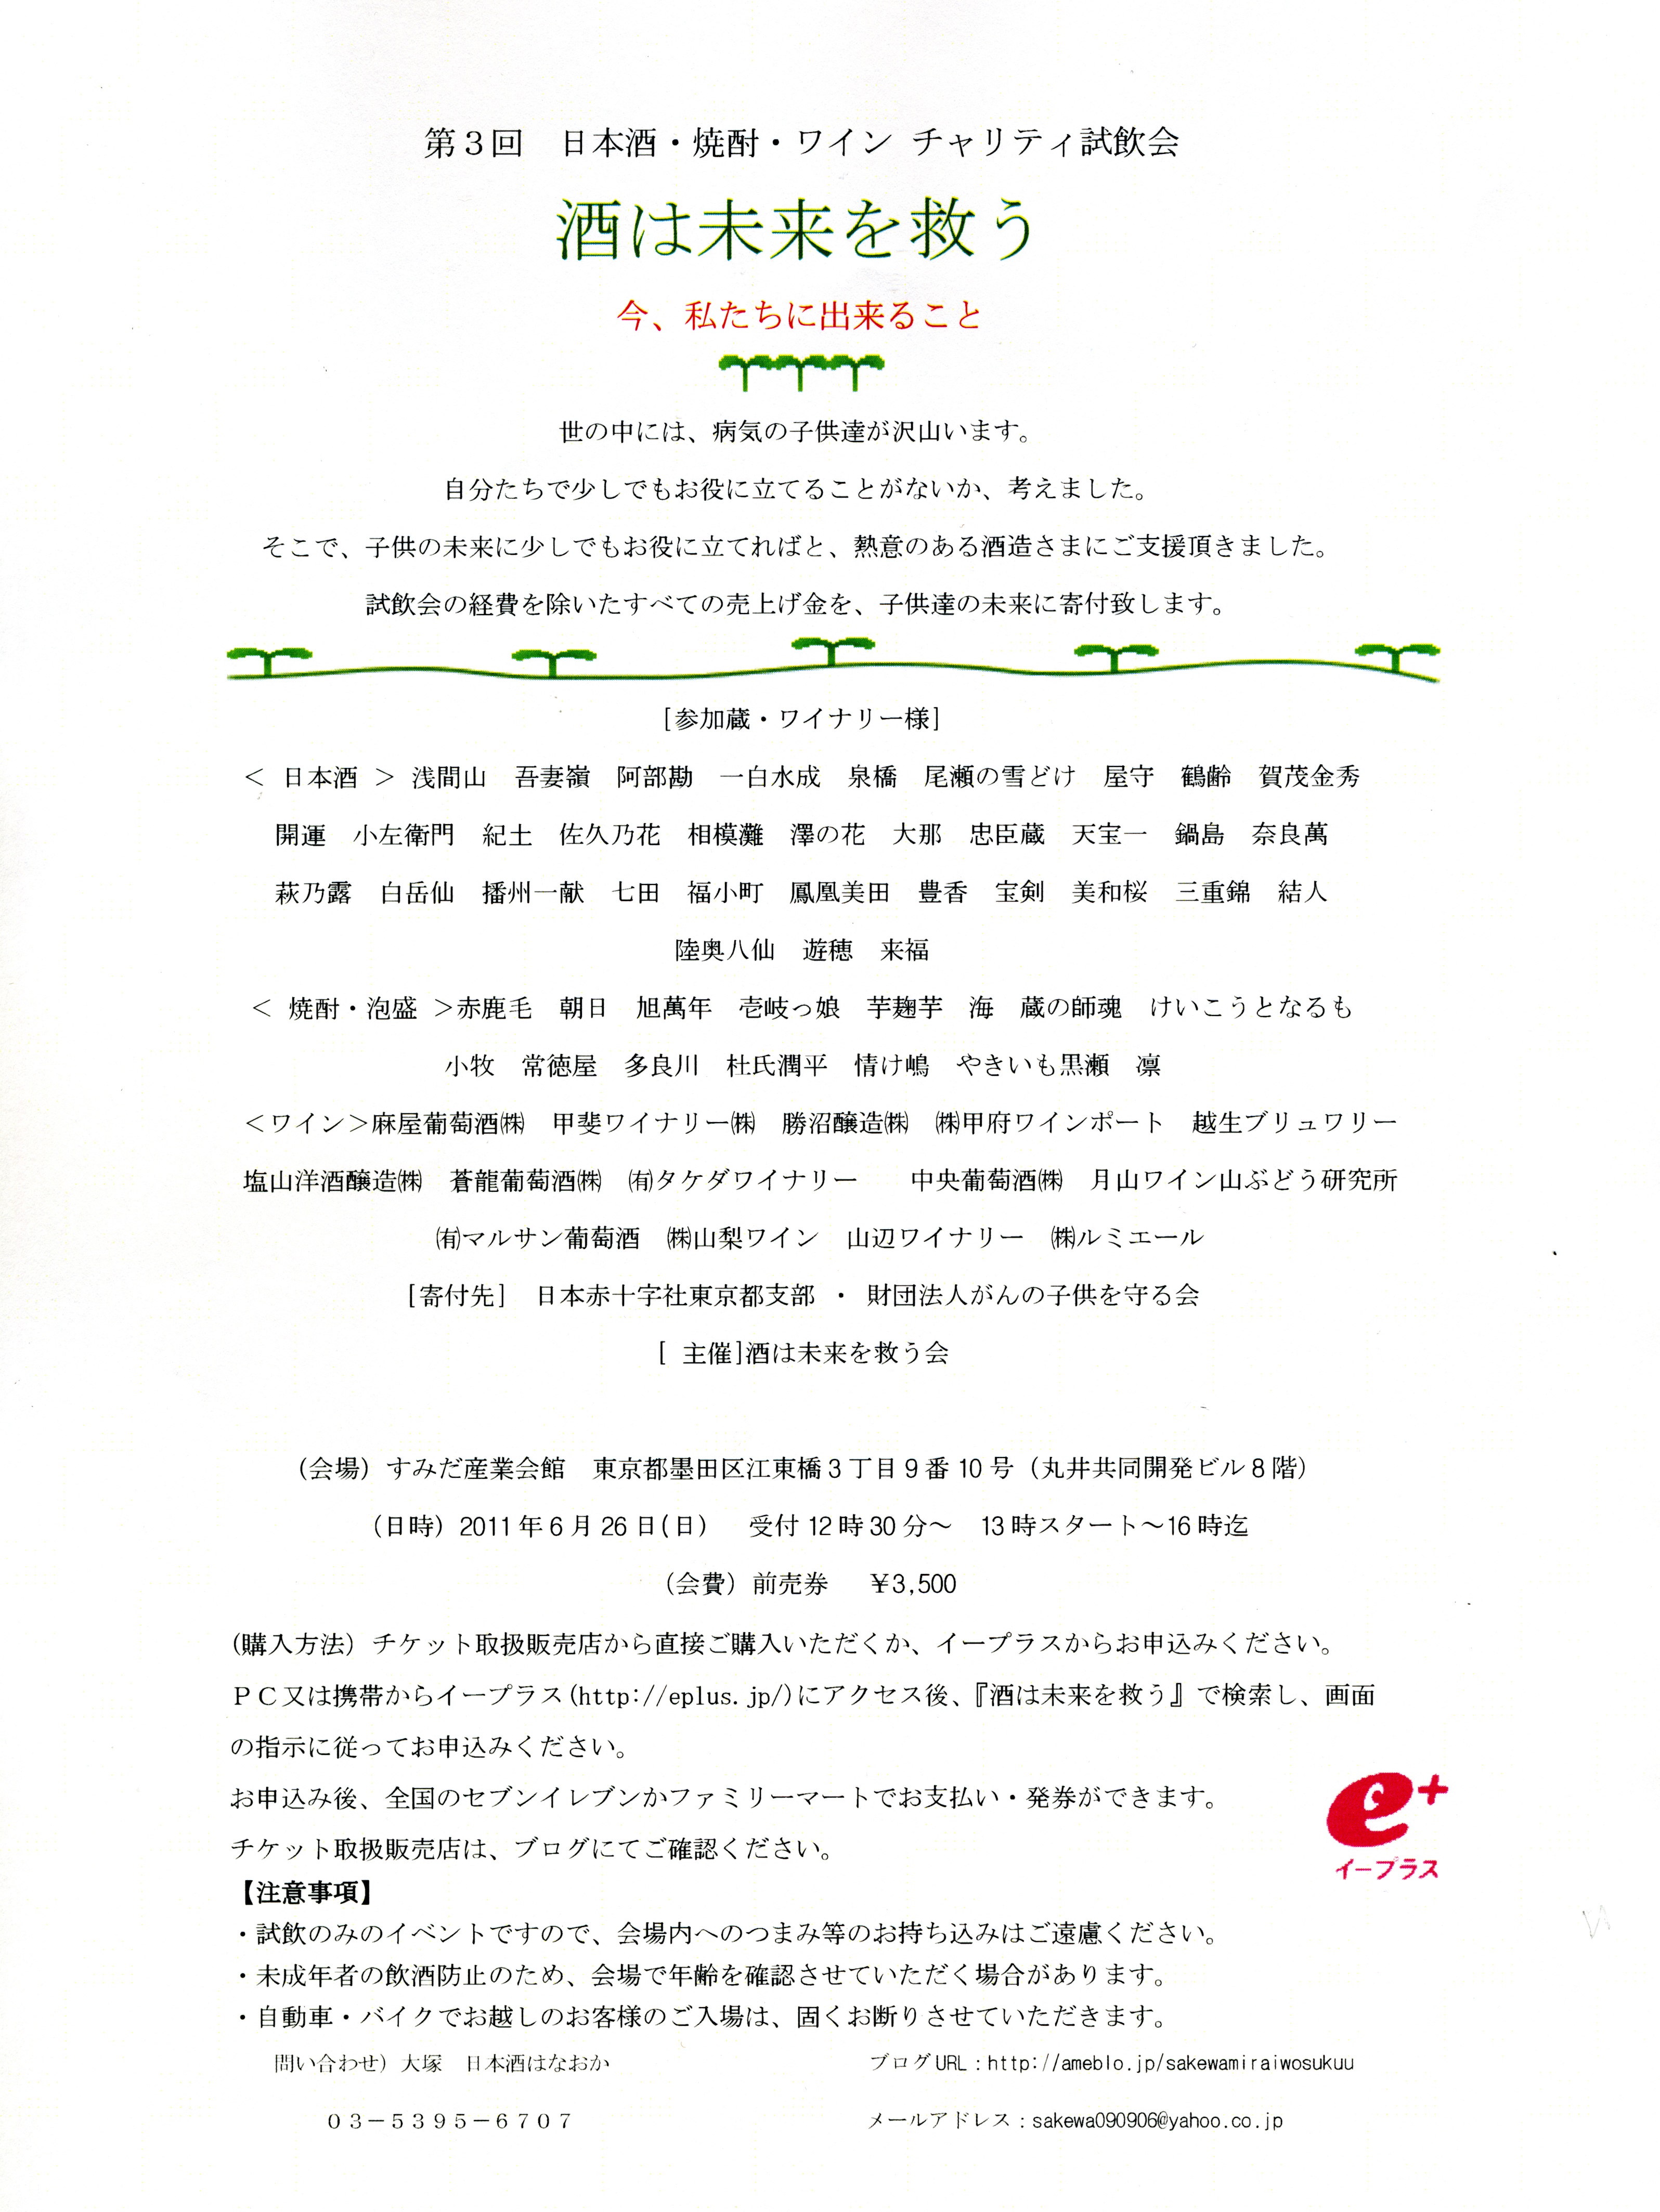 http://www.fukukomachi.com/blog/photo/mirai.jpg